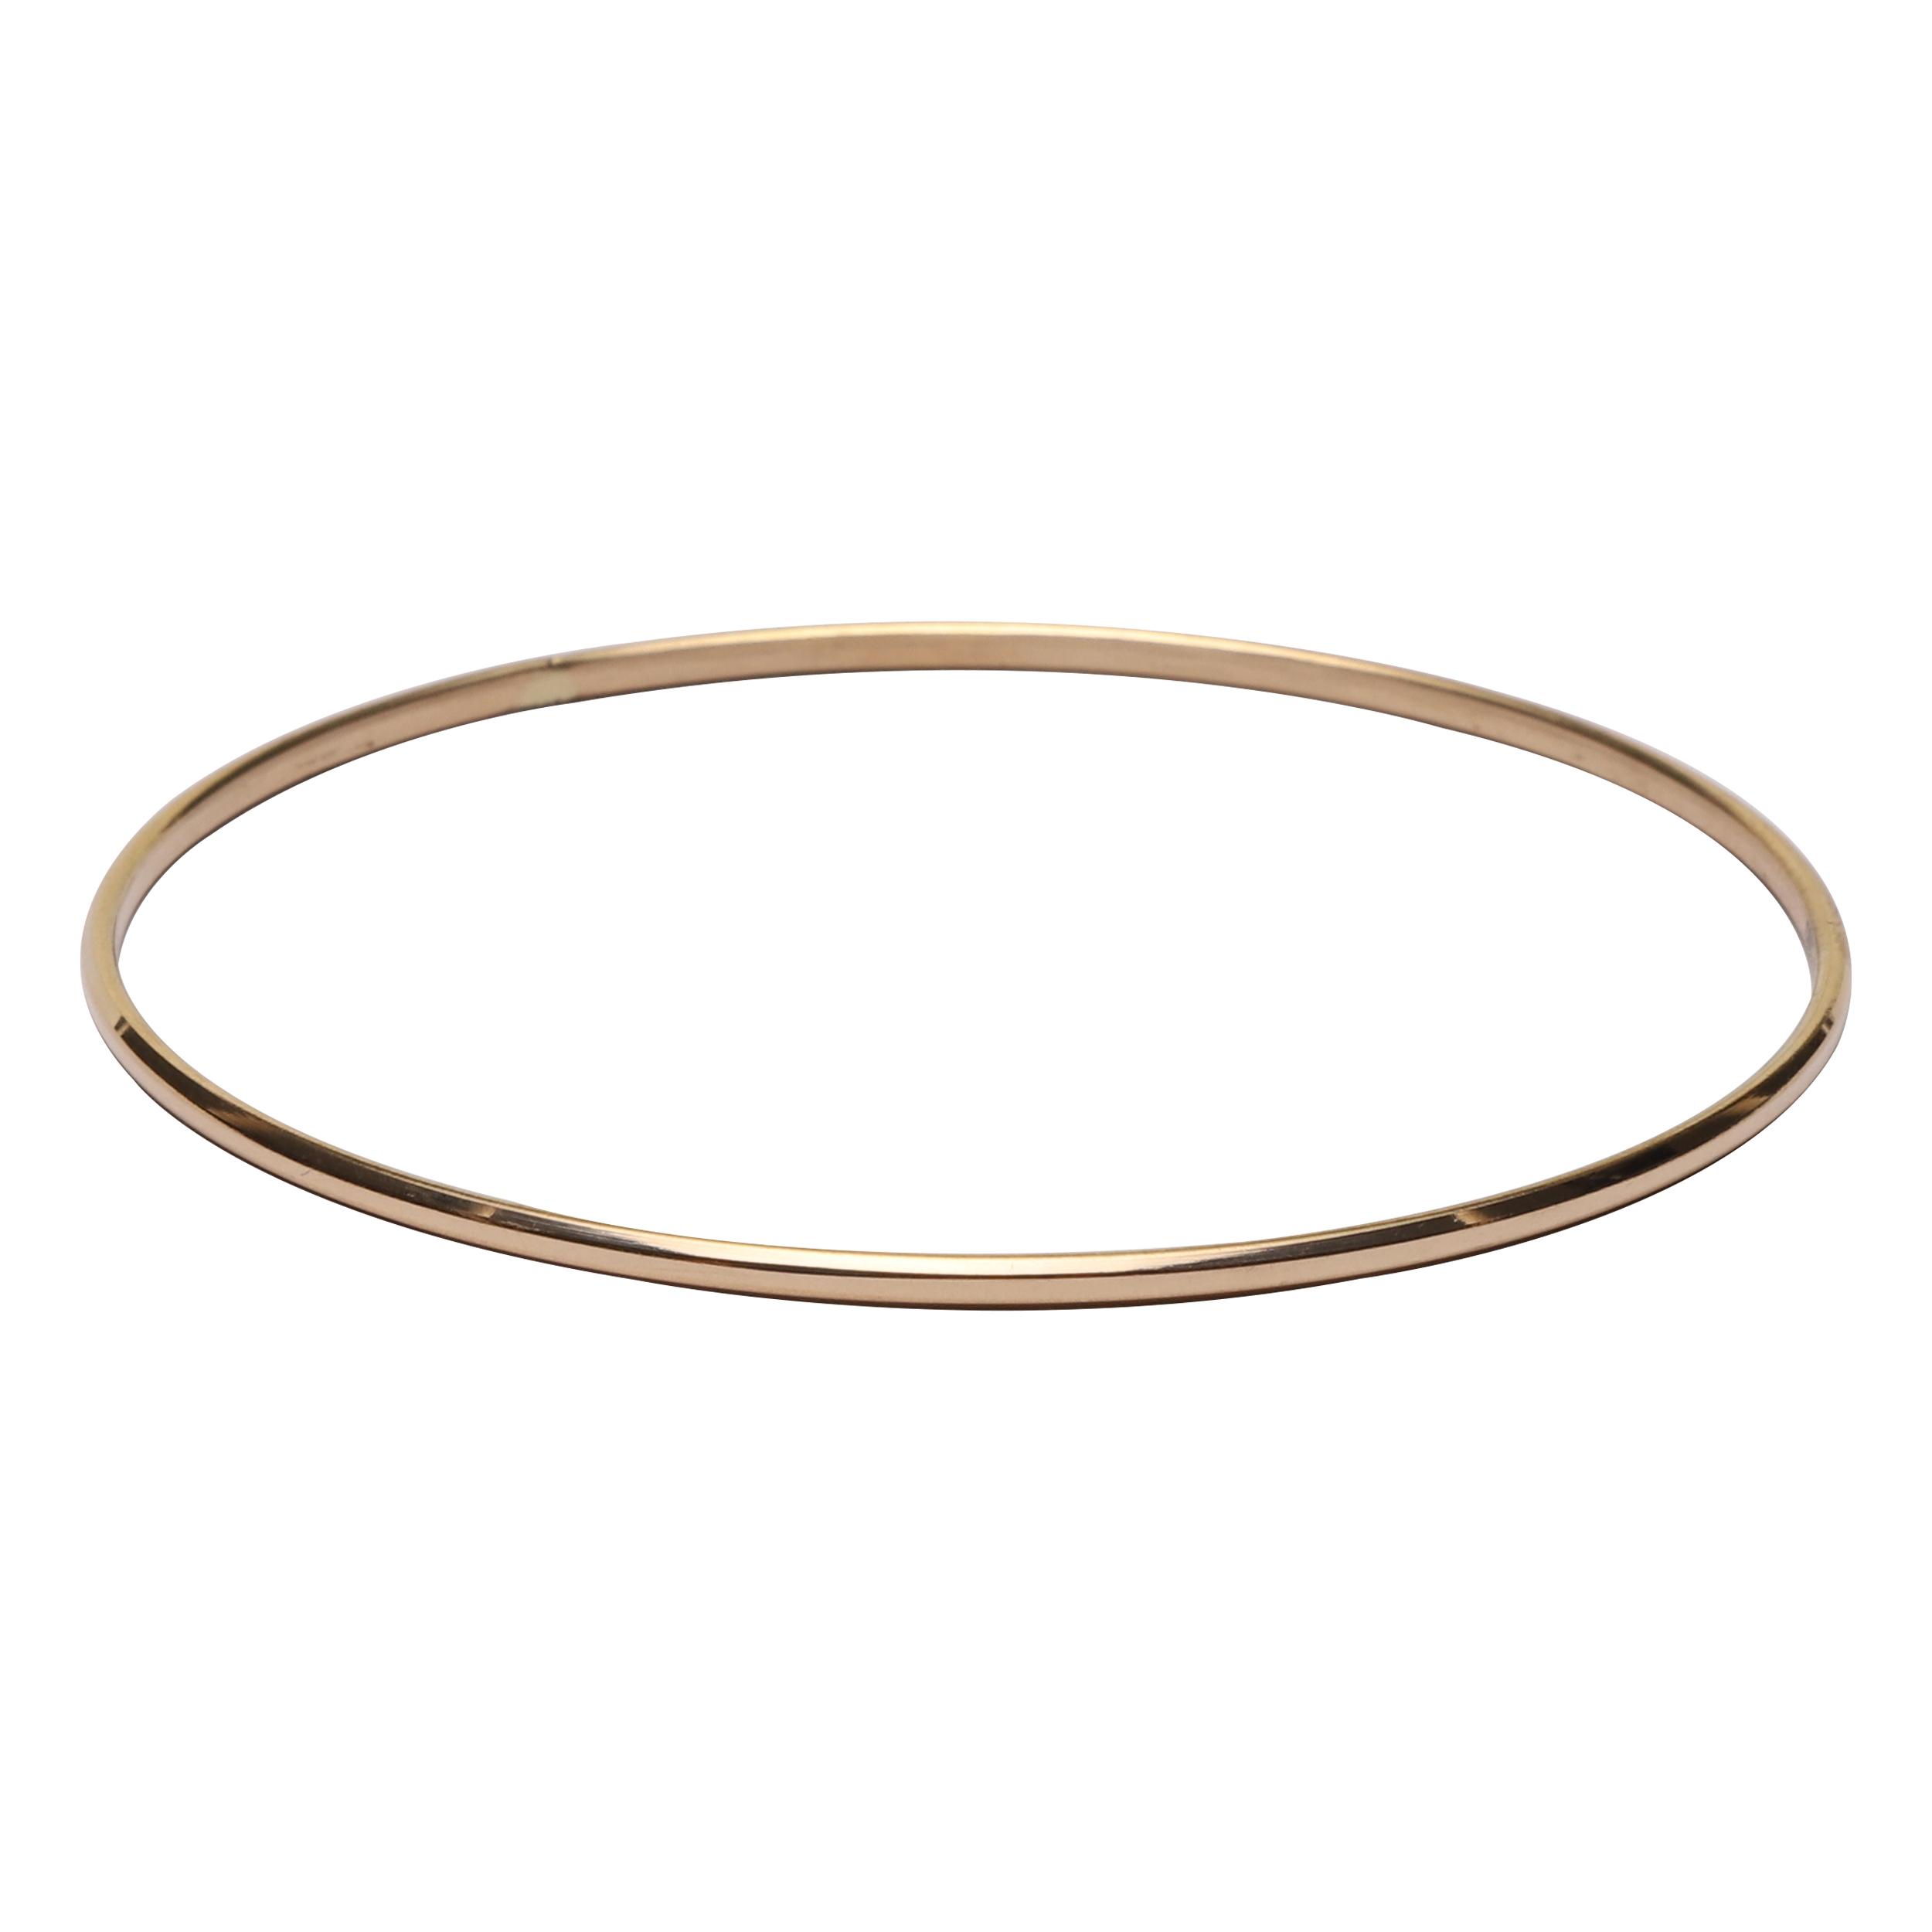 النگو طلا 18 عیار زنانه گوی گالری کد G390